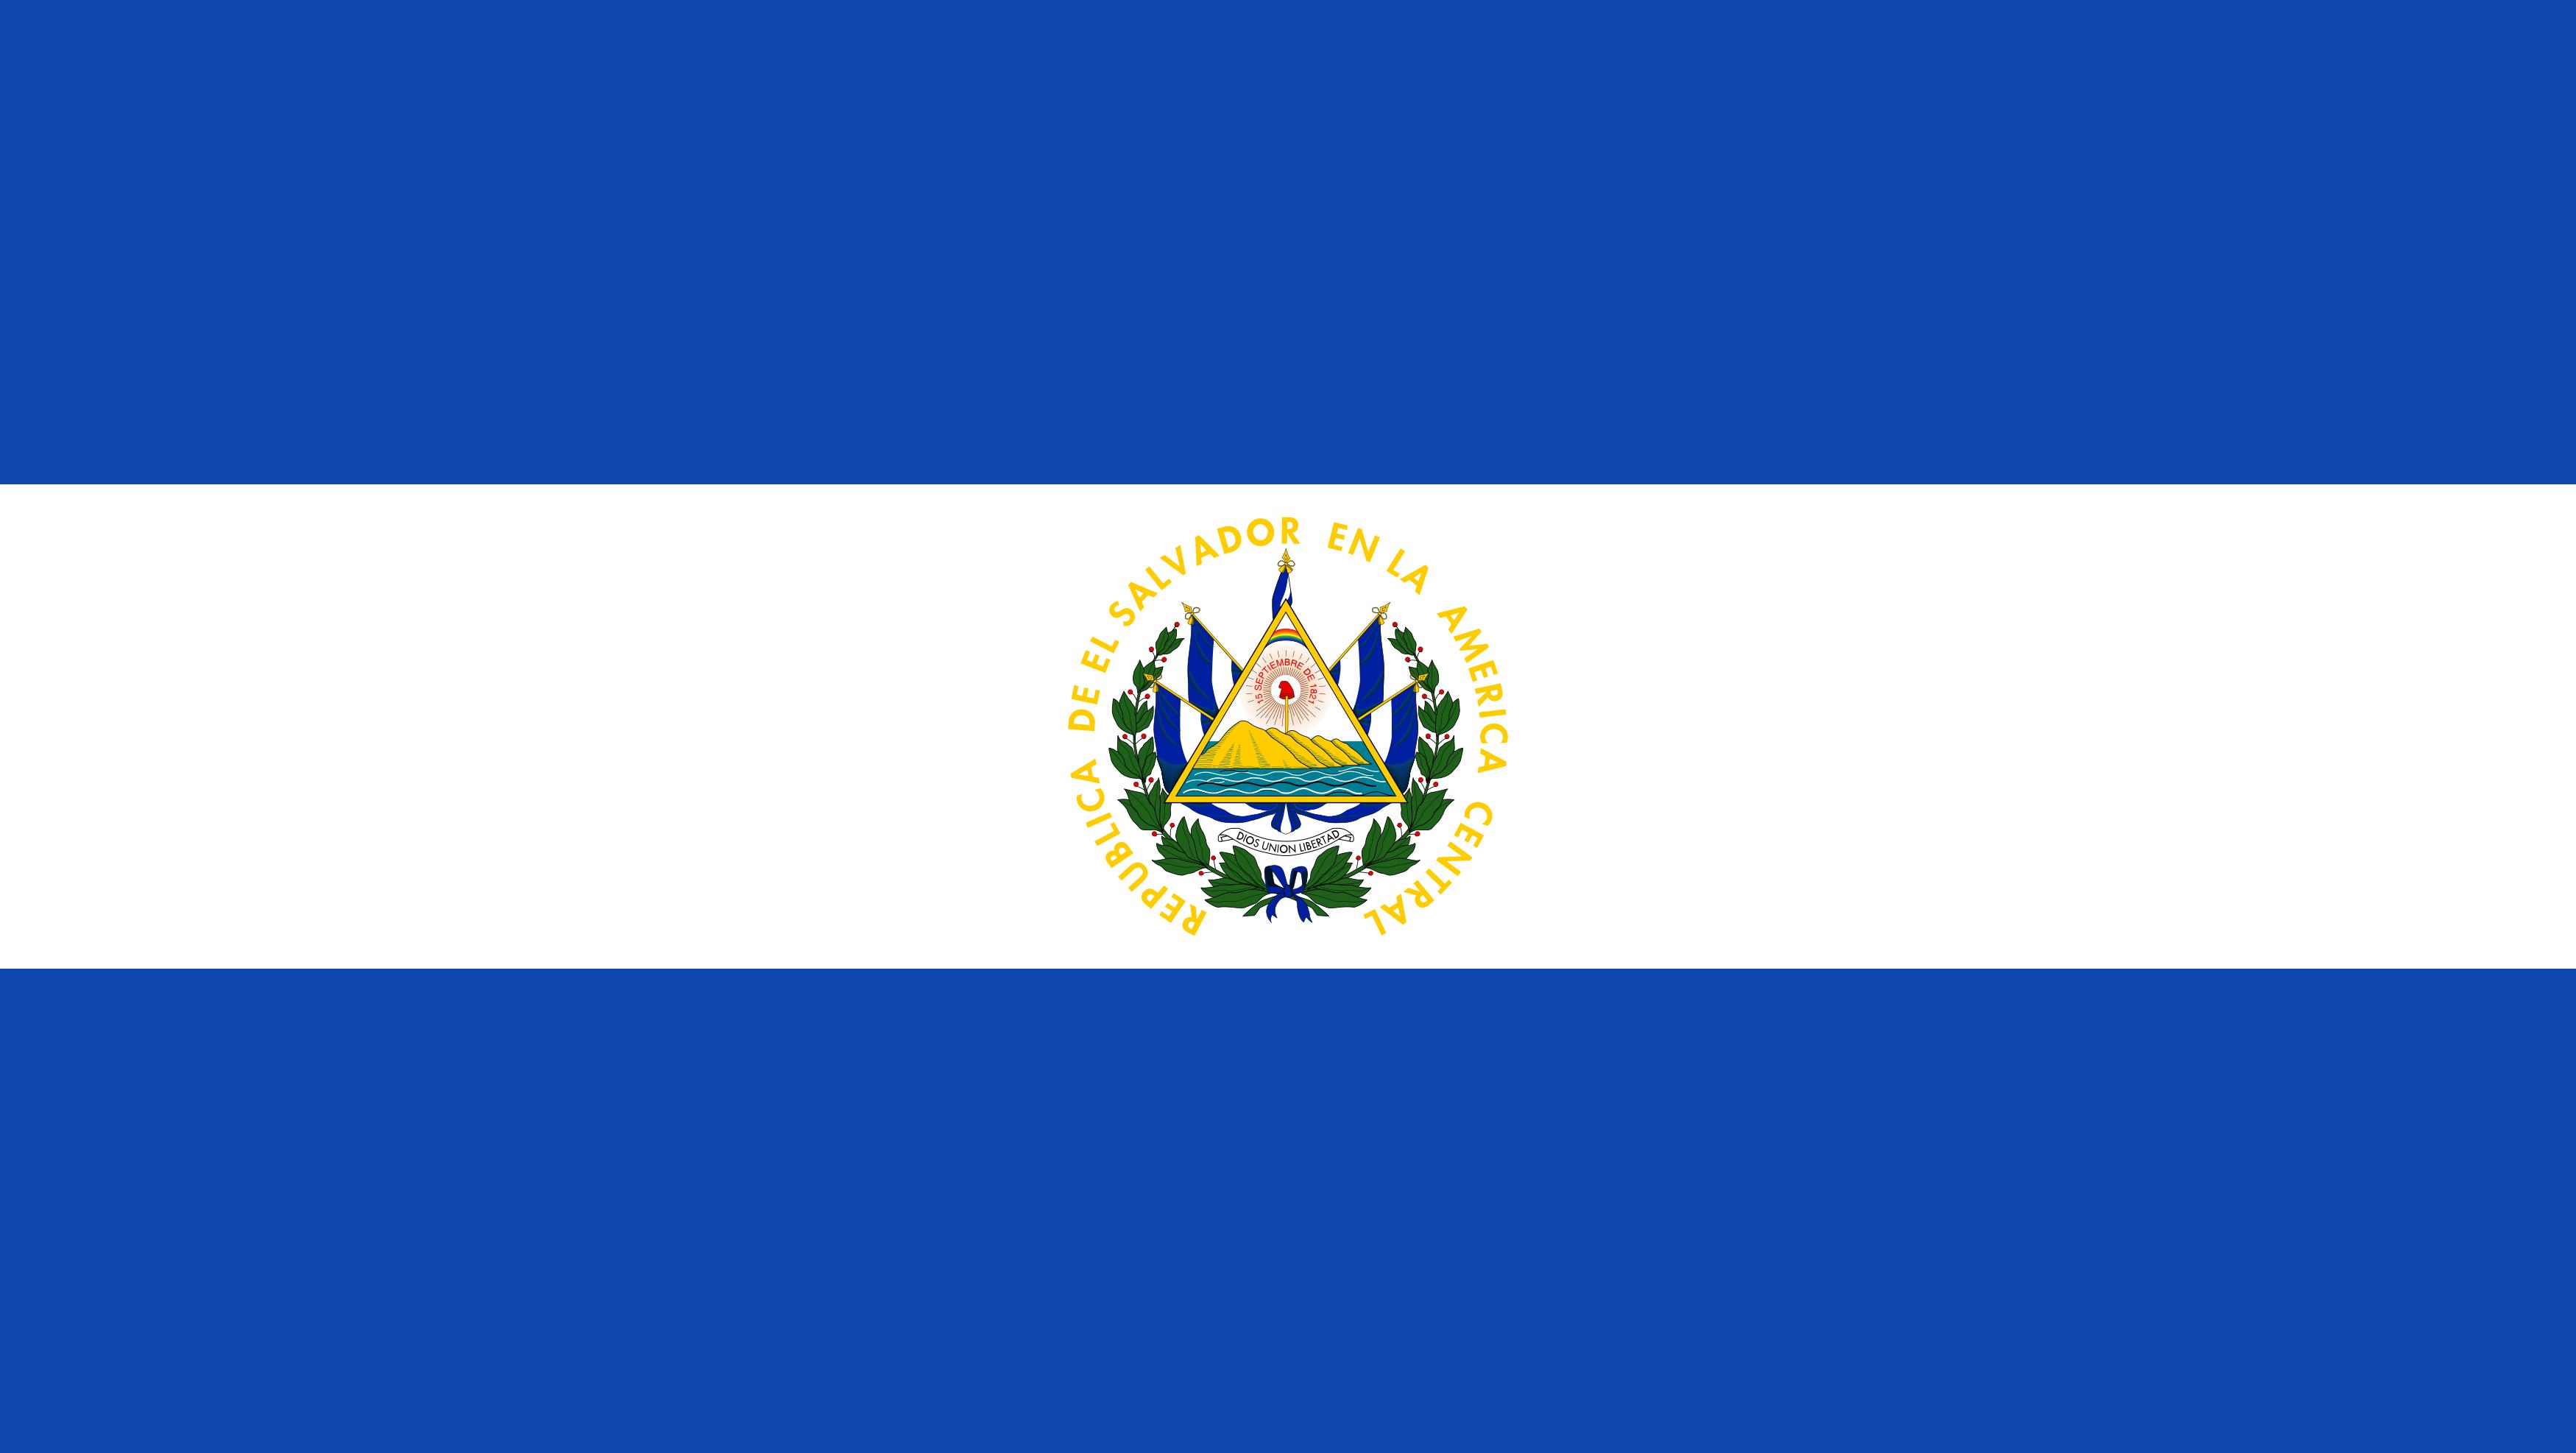 bandeira de el salvador - Bandeira de El Salvador